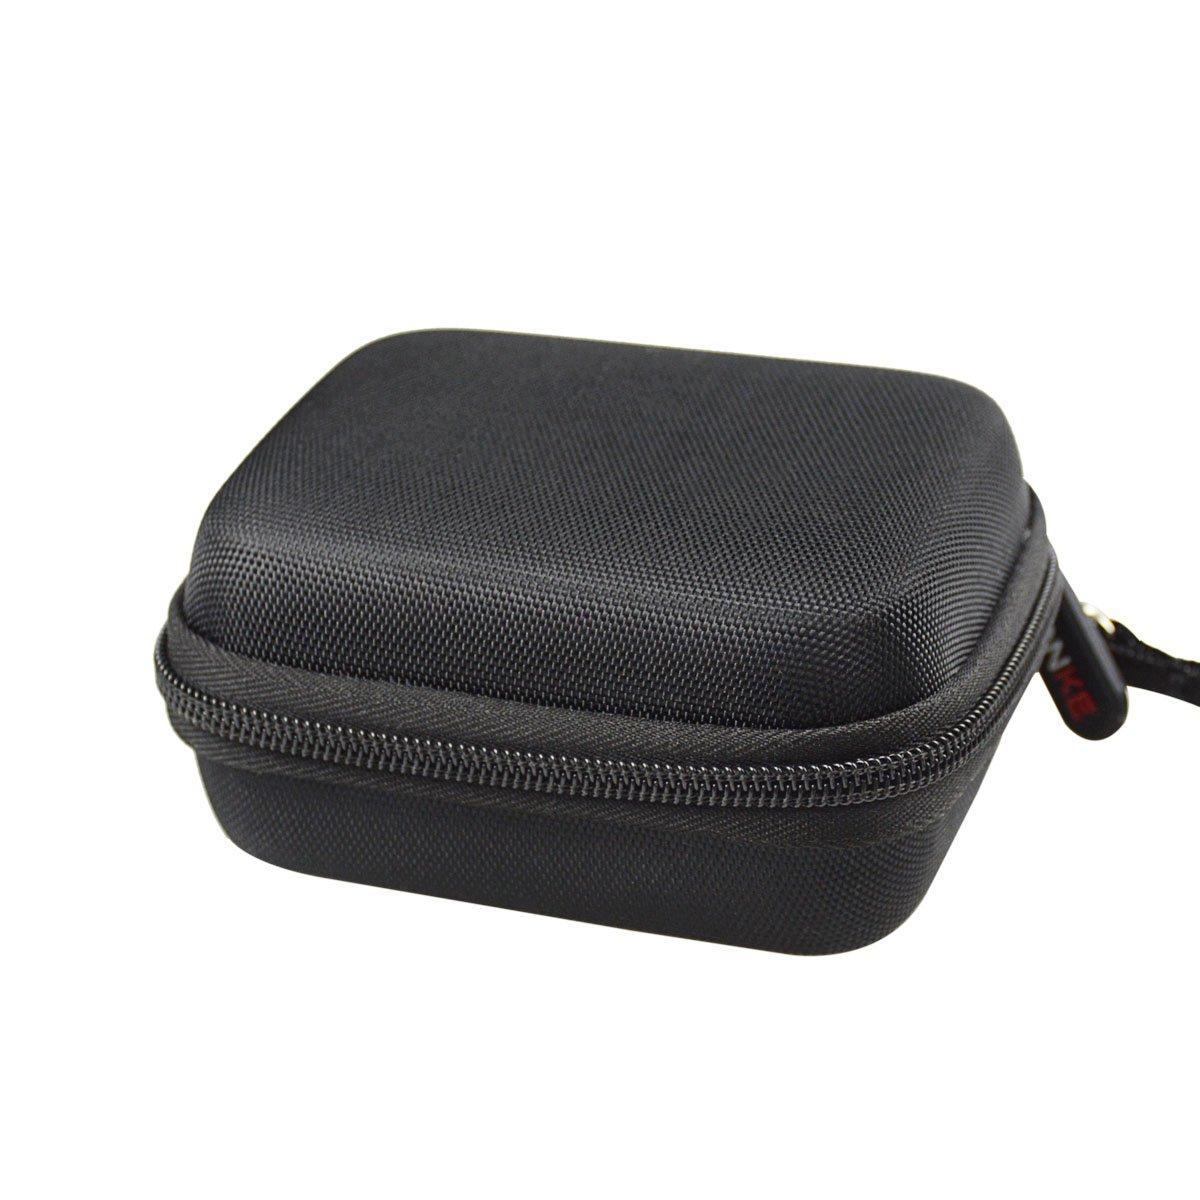 Voyage Stockage Porter /Étui Housse pour JBL JBLGO2BLK Enceinte Portable Bluetooth by AONKE